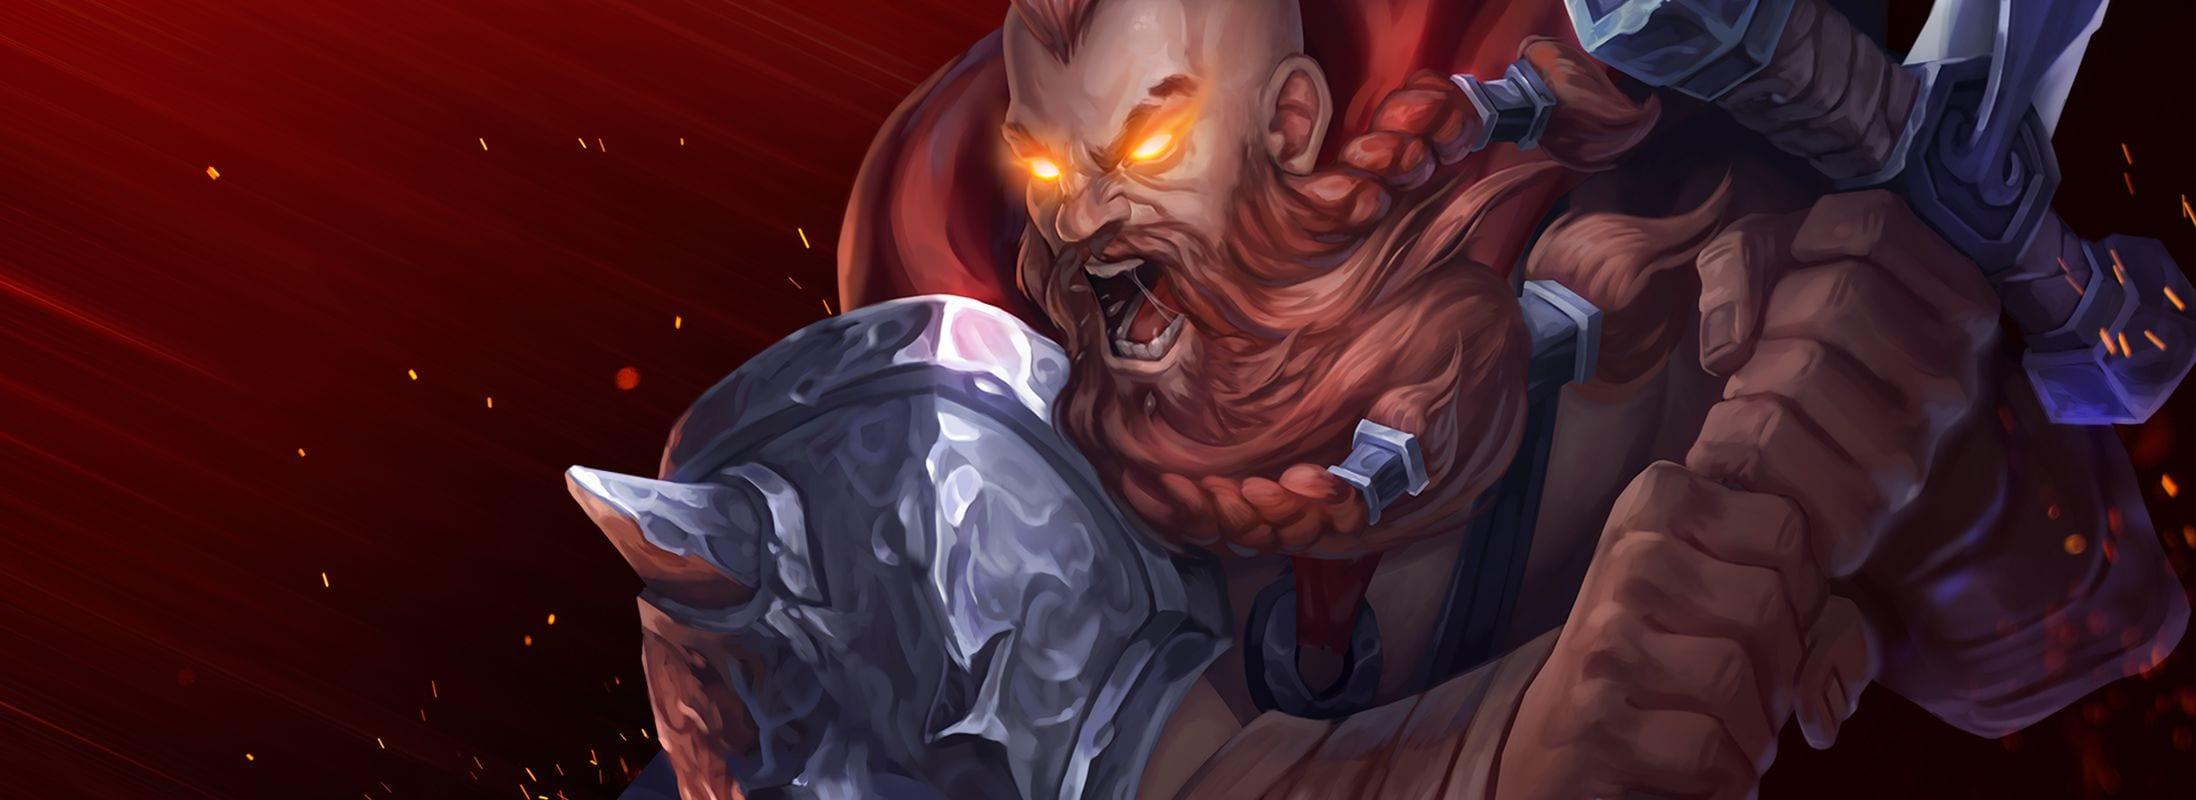 vikings go to hell slot